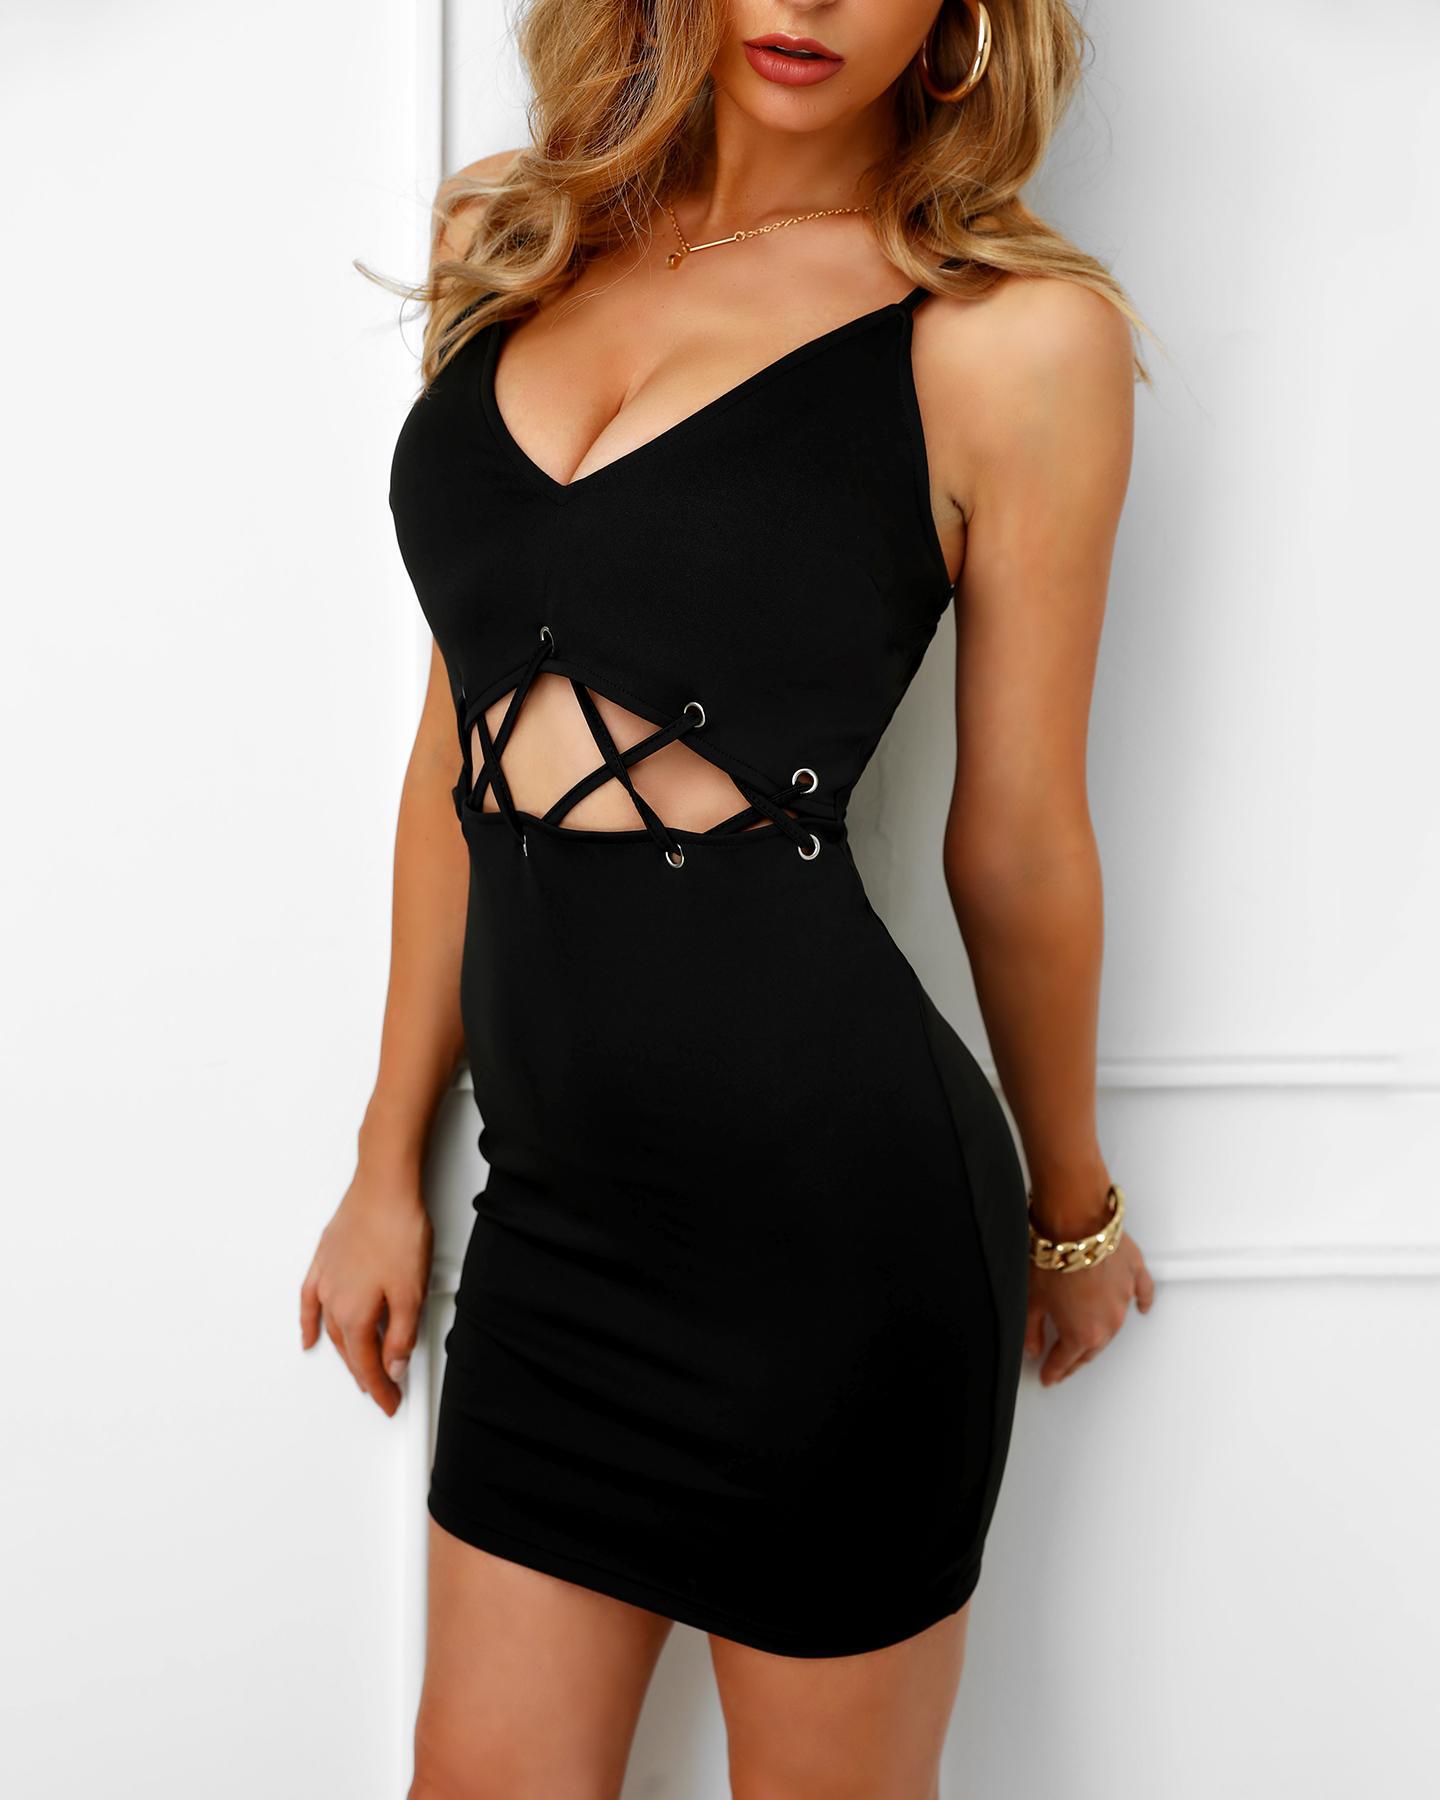 Spaghetti Strap Eyelet Lace-Up Bodycon Dress, Black